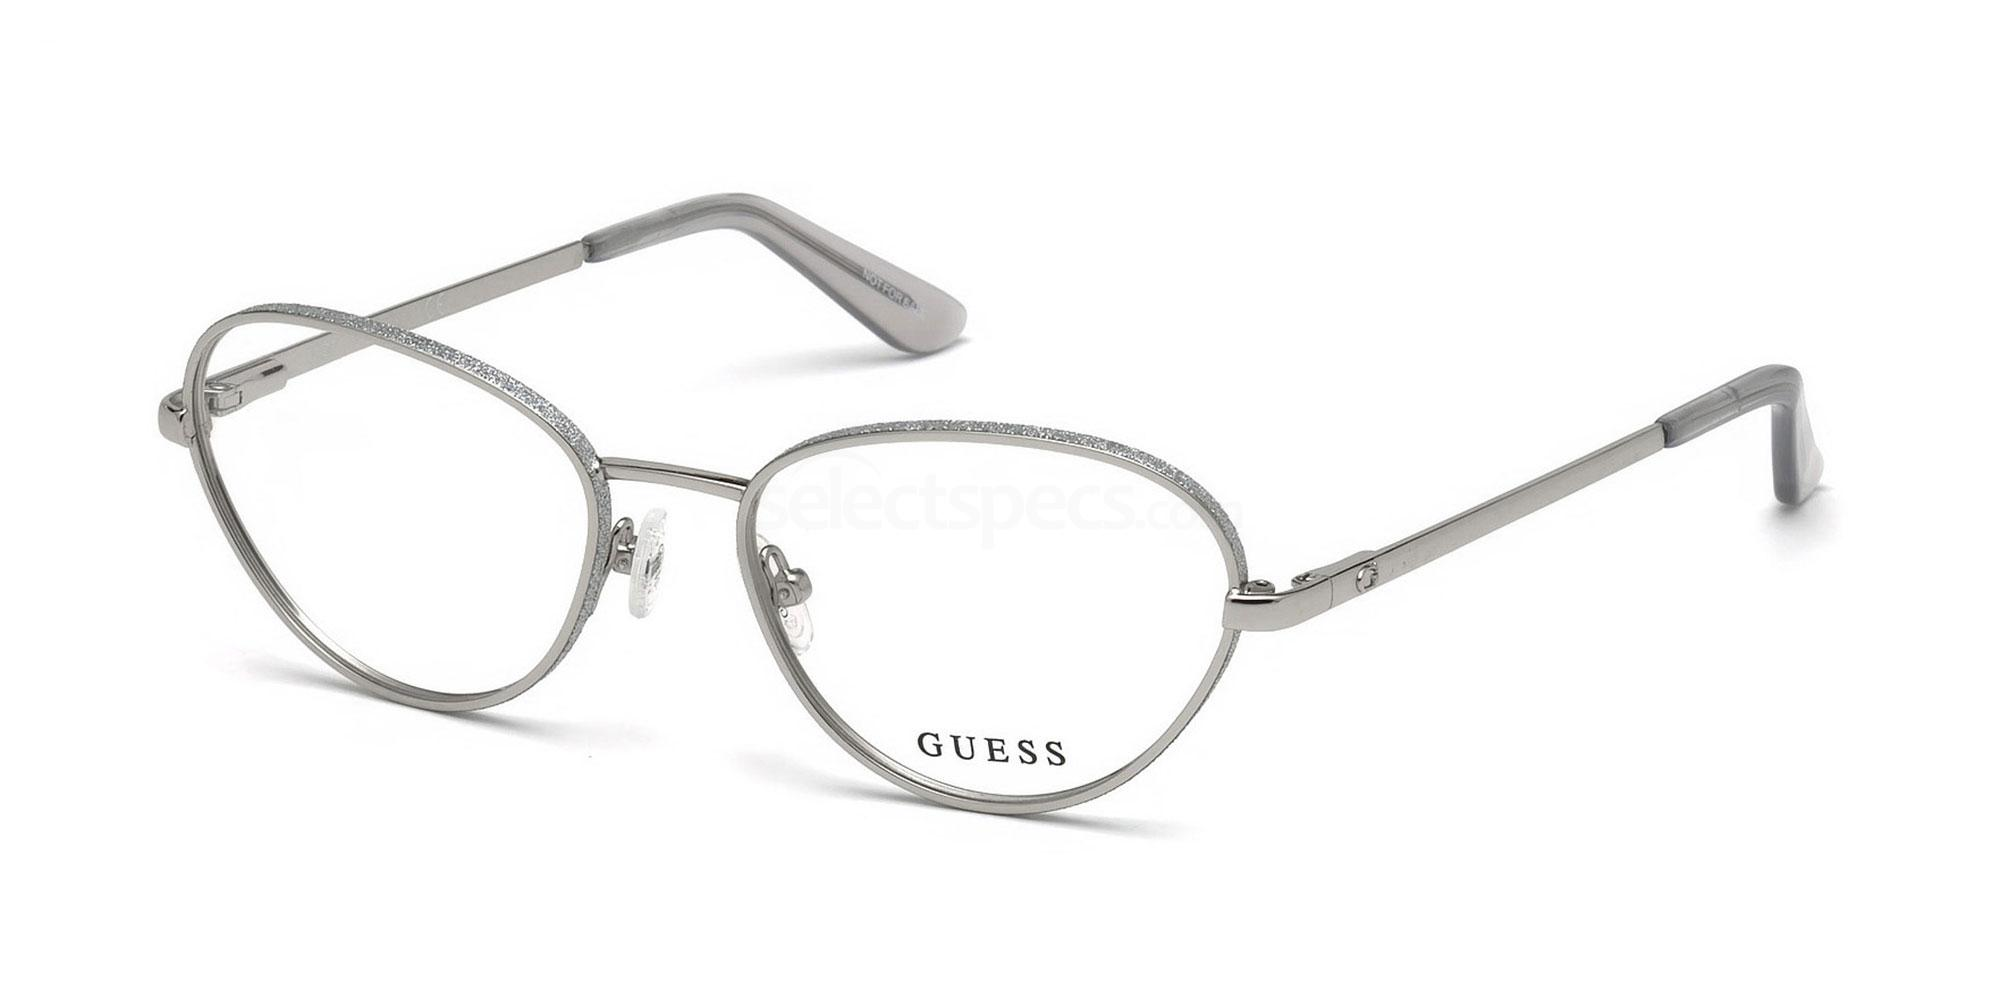 010 GU2670 Glasses, Guess